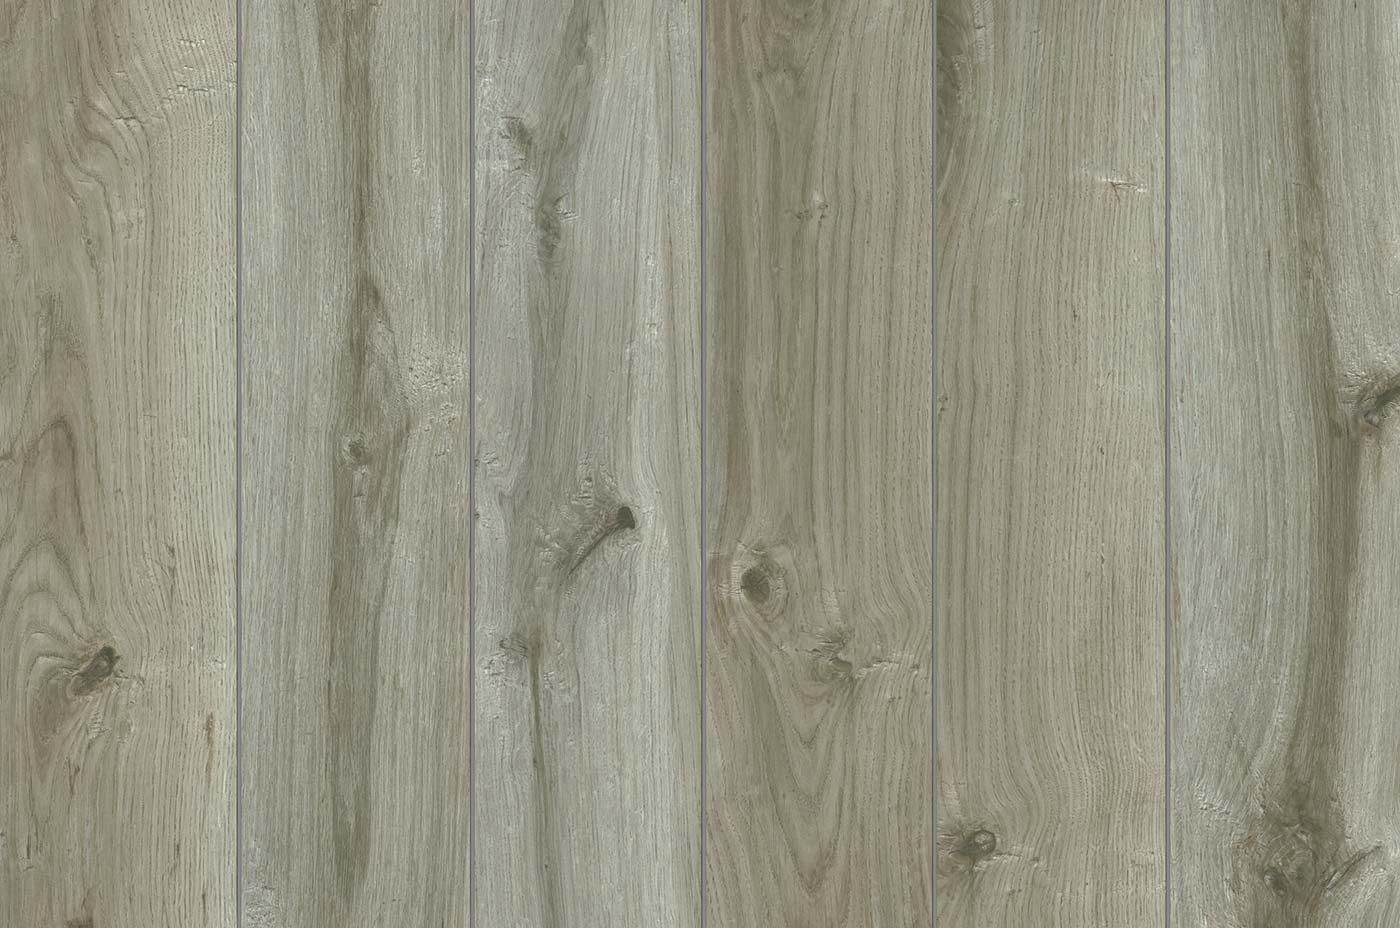 Urban Wood By Florim Lmg Tile